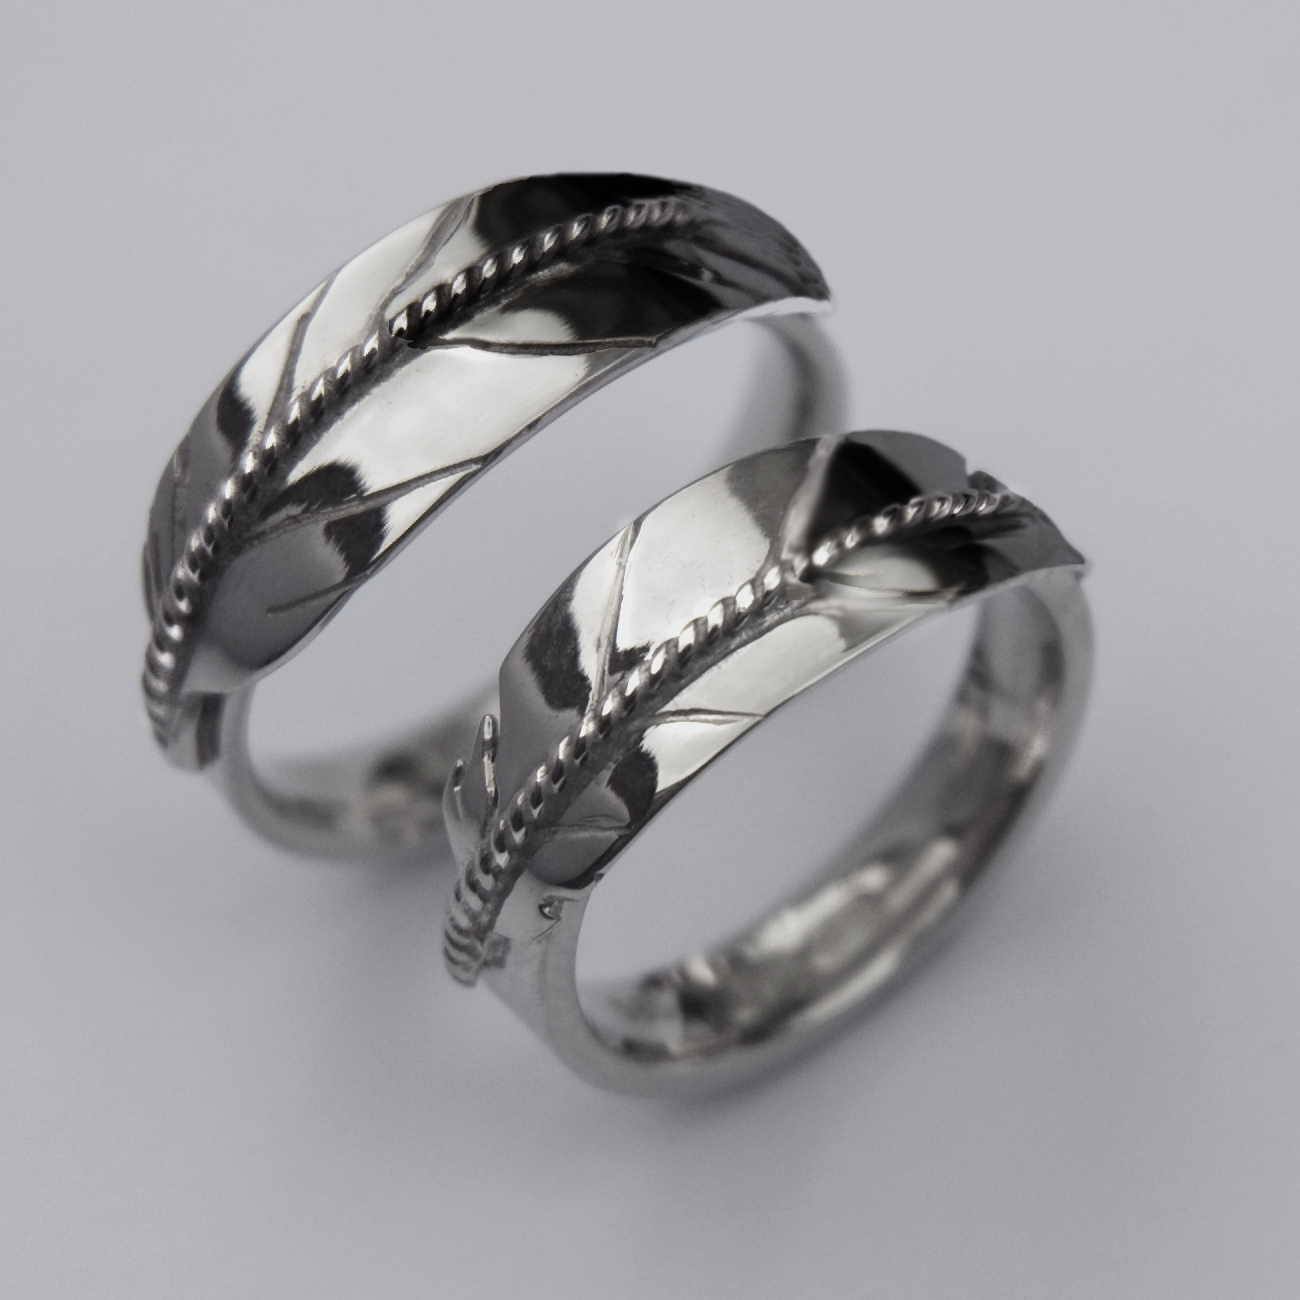 ojibwe native american silver wedding rings gallery 2 - Native American Wedding Rings